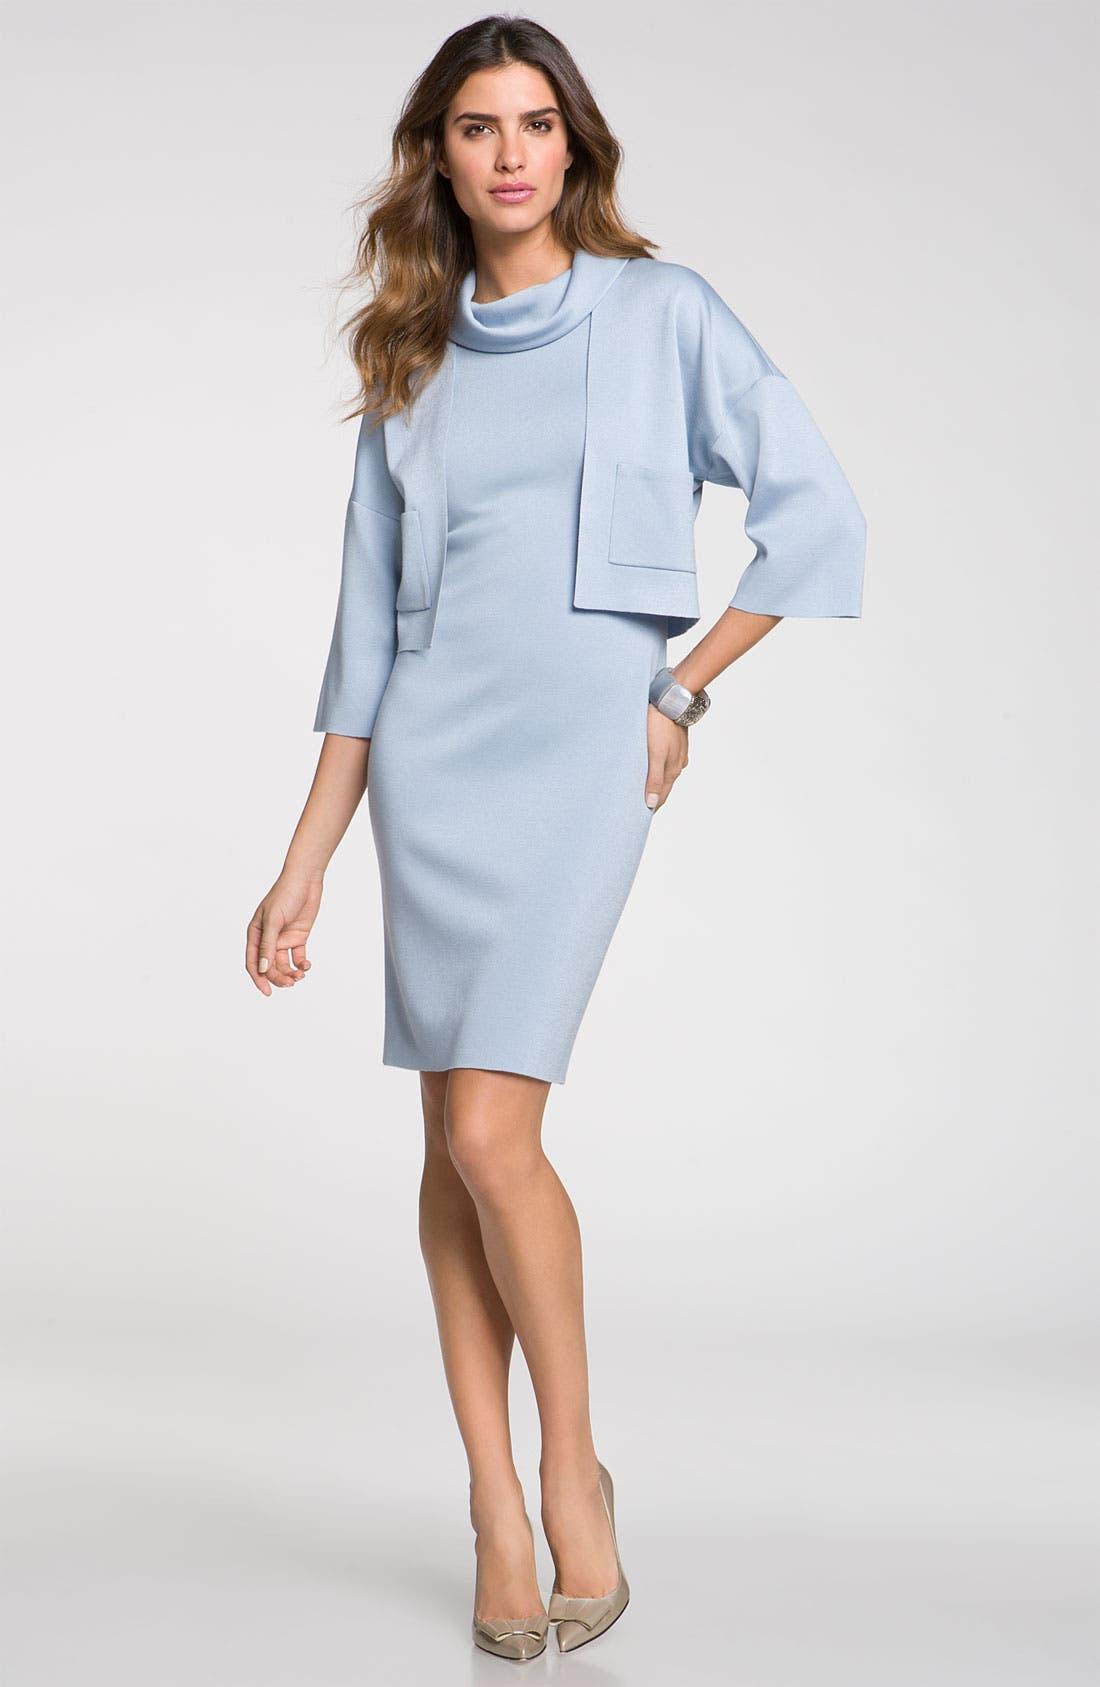 Main Image - St. John Collection Jacket & Knit Dress